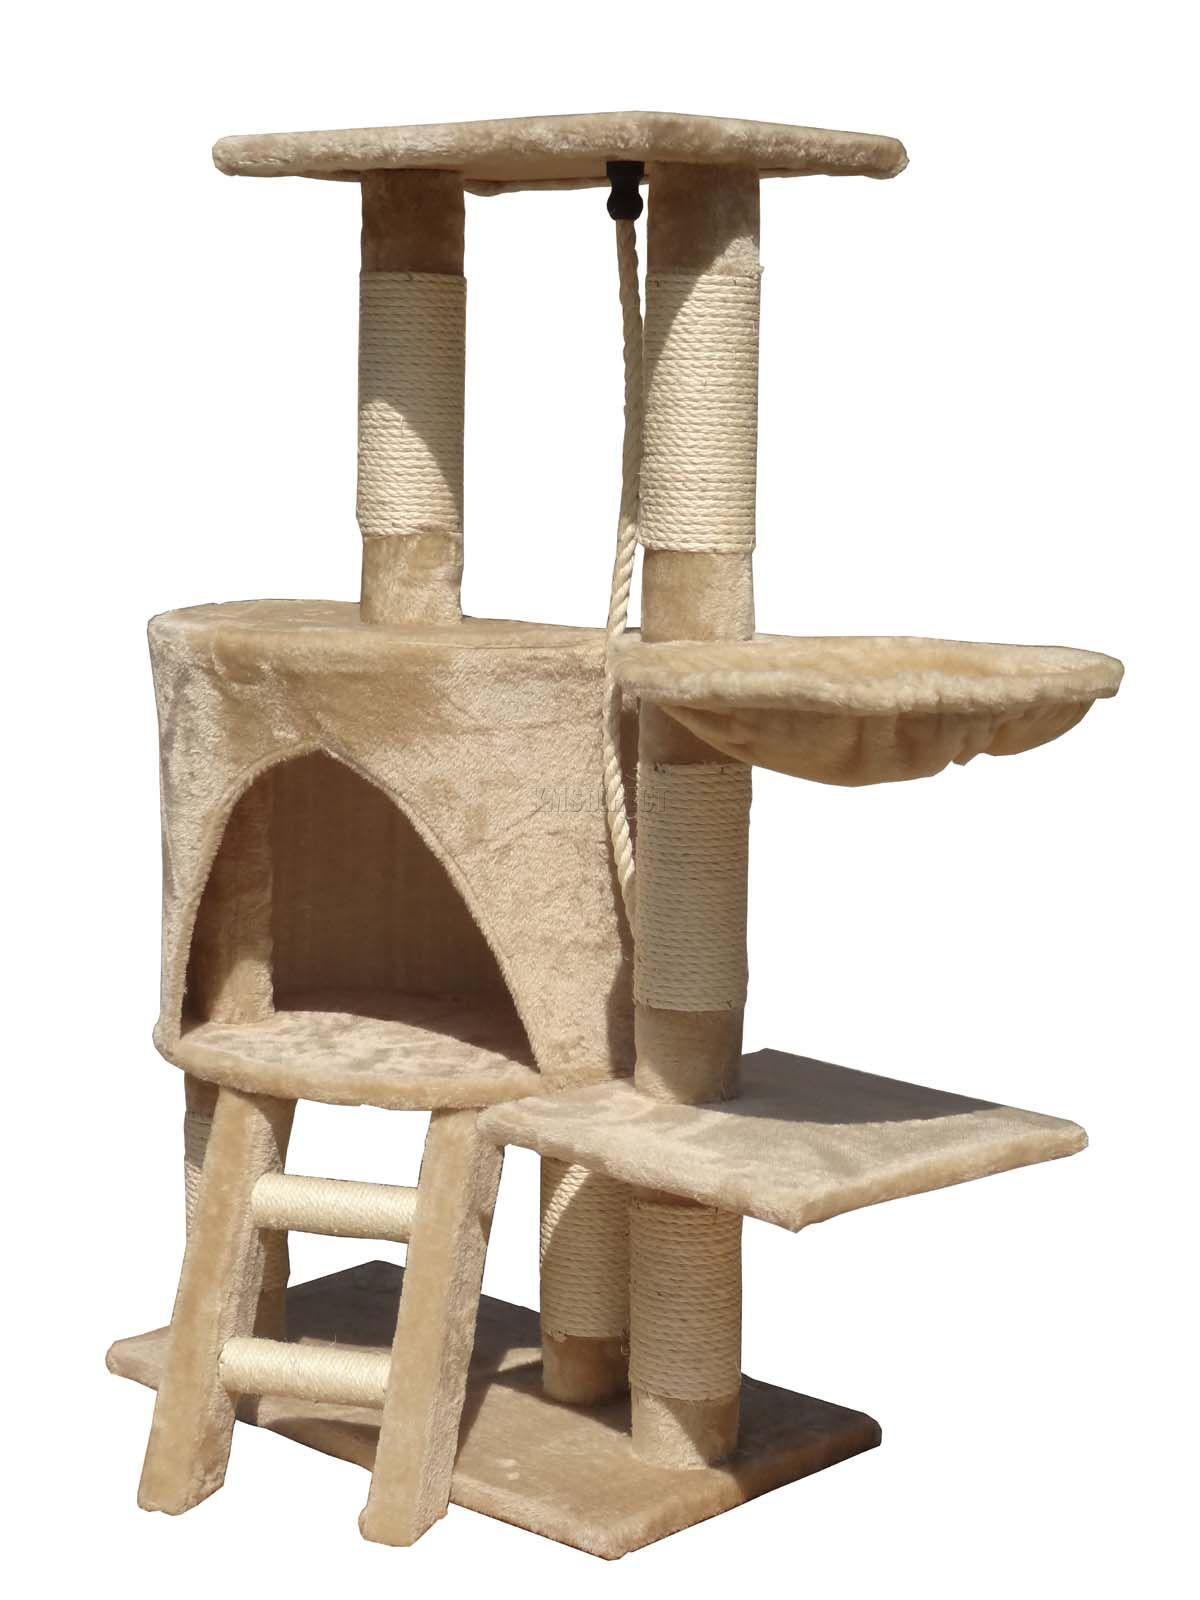 cat activity centre scratch scratcher scratching post toys. Black Bedroom Furniture Sets. Home Design Ideas